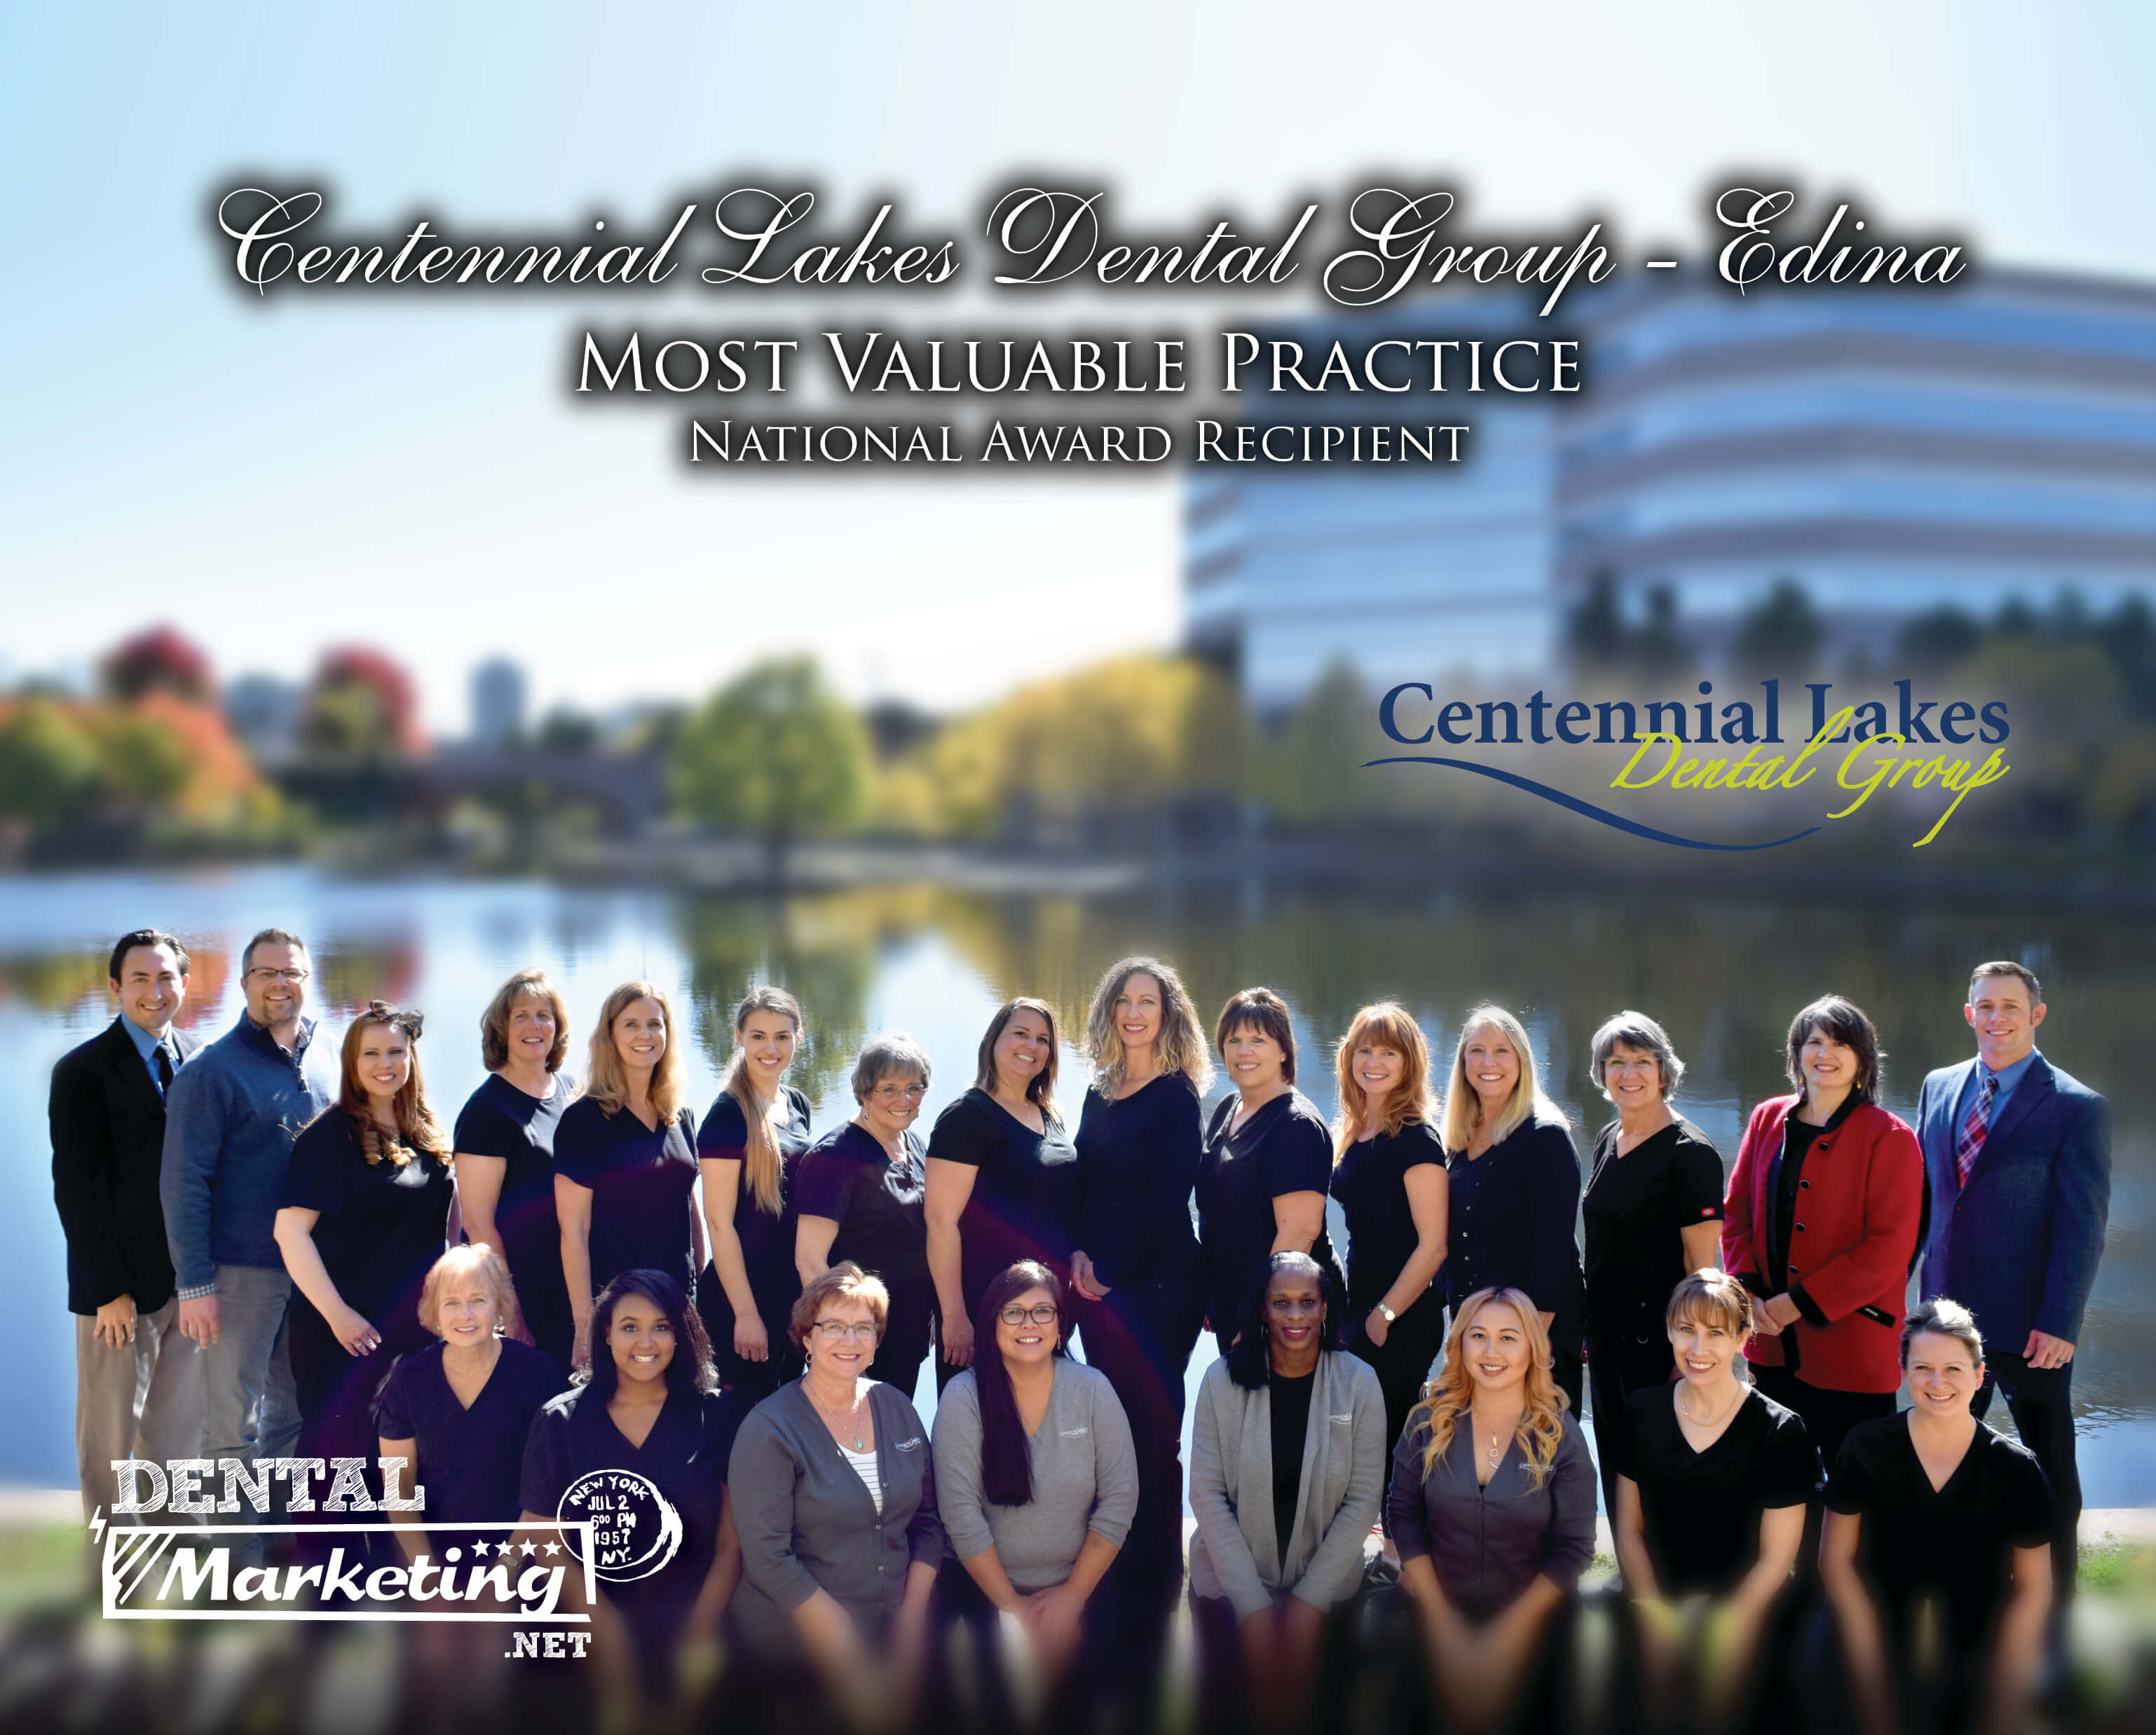 Centennial Lakes Dental Group Staff